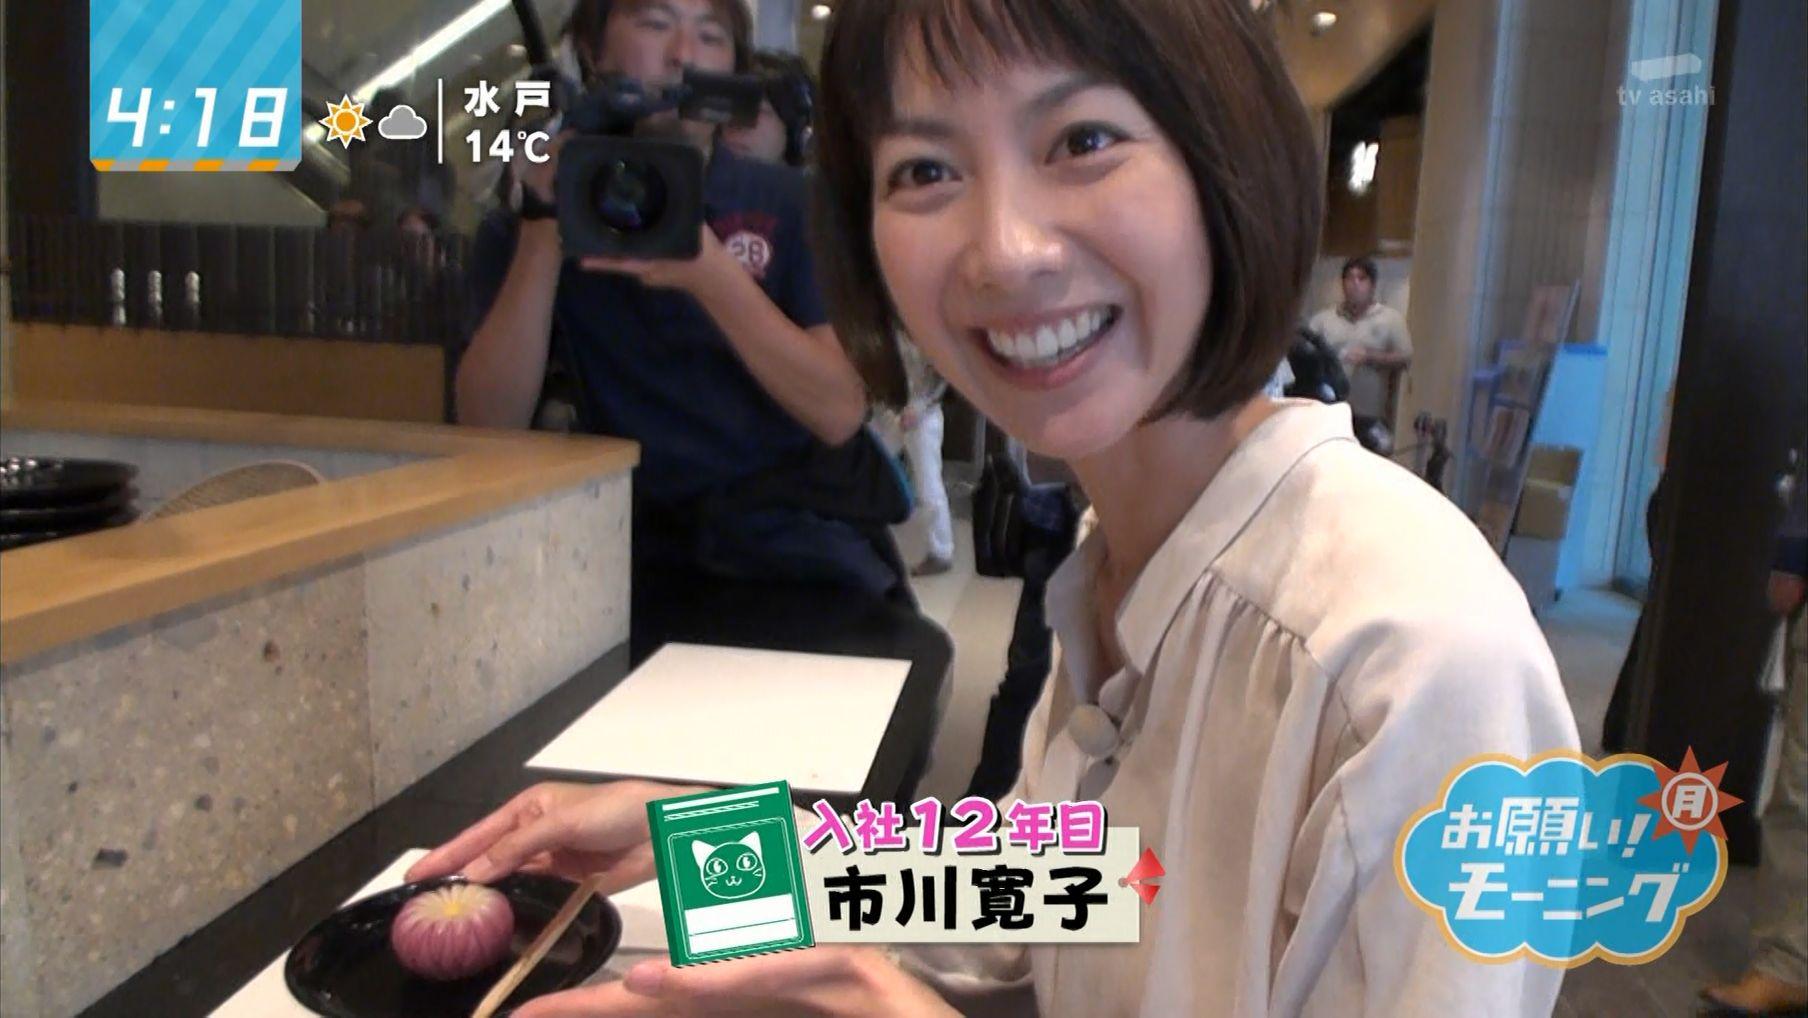 Super J チャンネル ぴろりん♪市川寛子 第82話 [転載禁止]©2ch.netYouTube動画>9本 ->画像>151枚